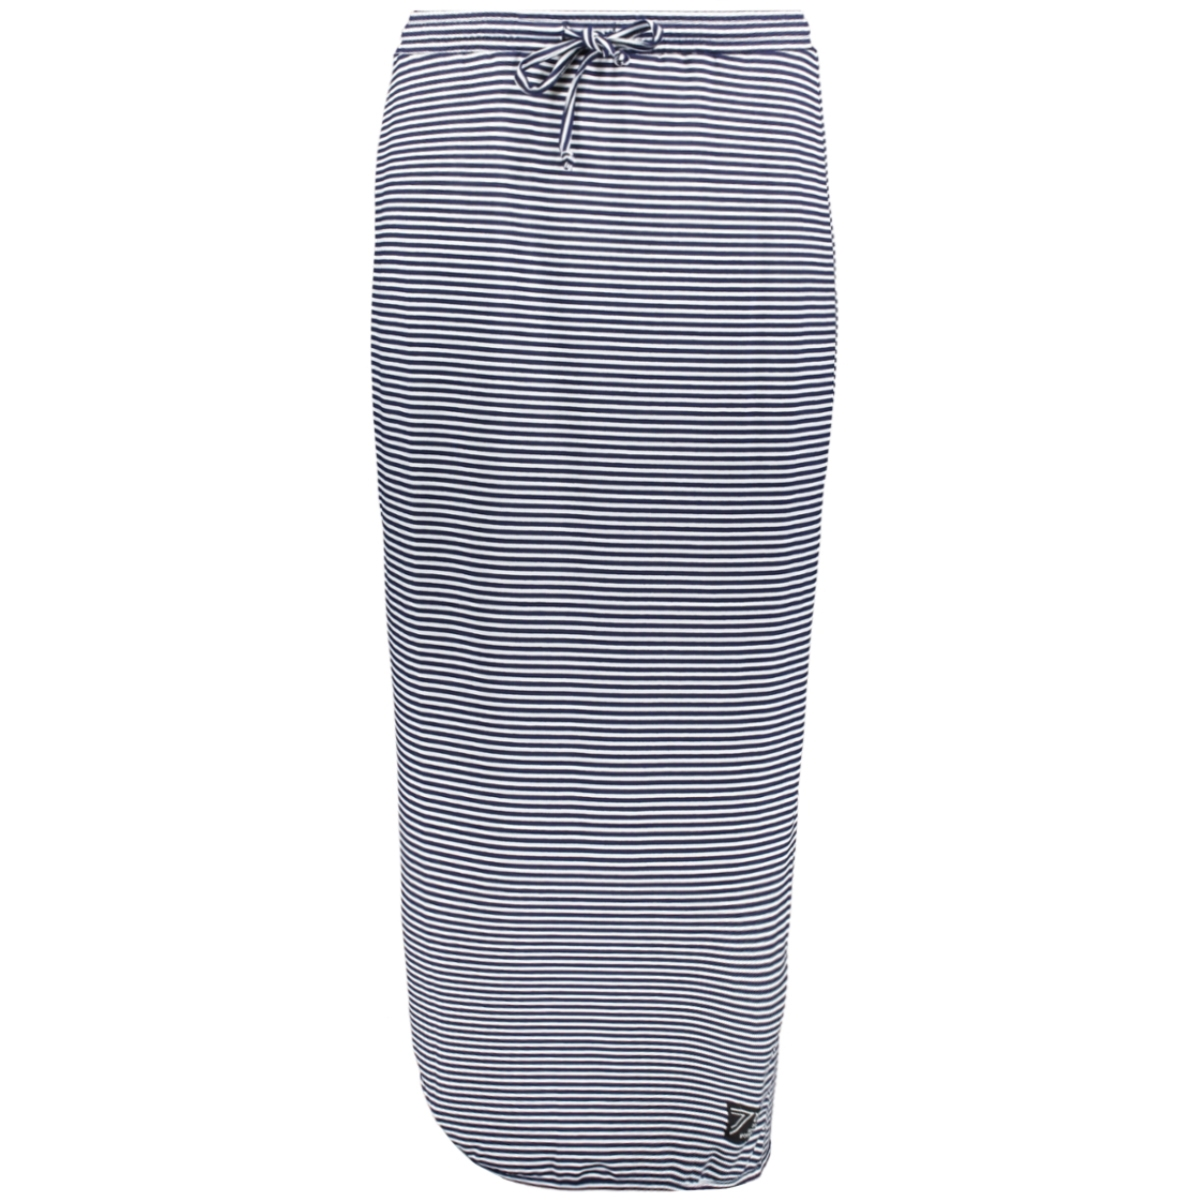 mandy sporty striped skirt 203 zoso rok navy/white